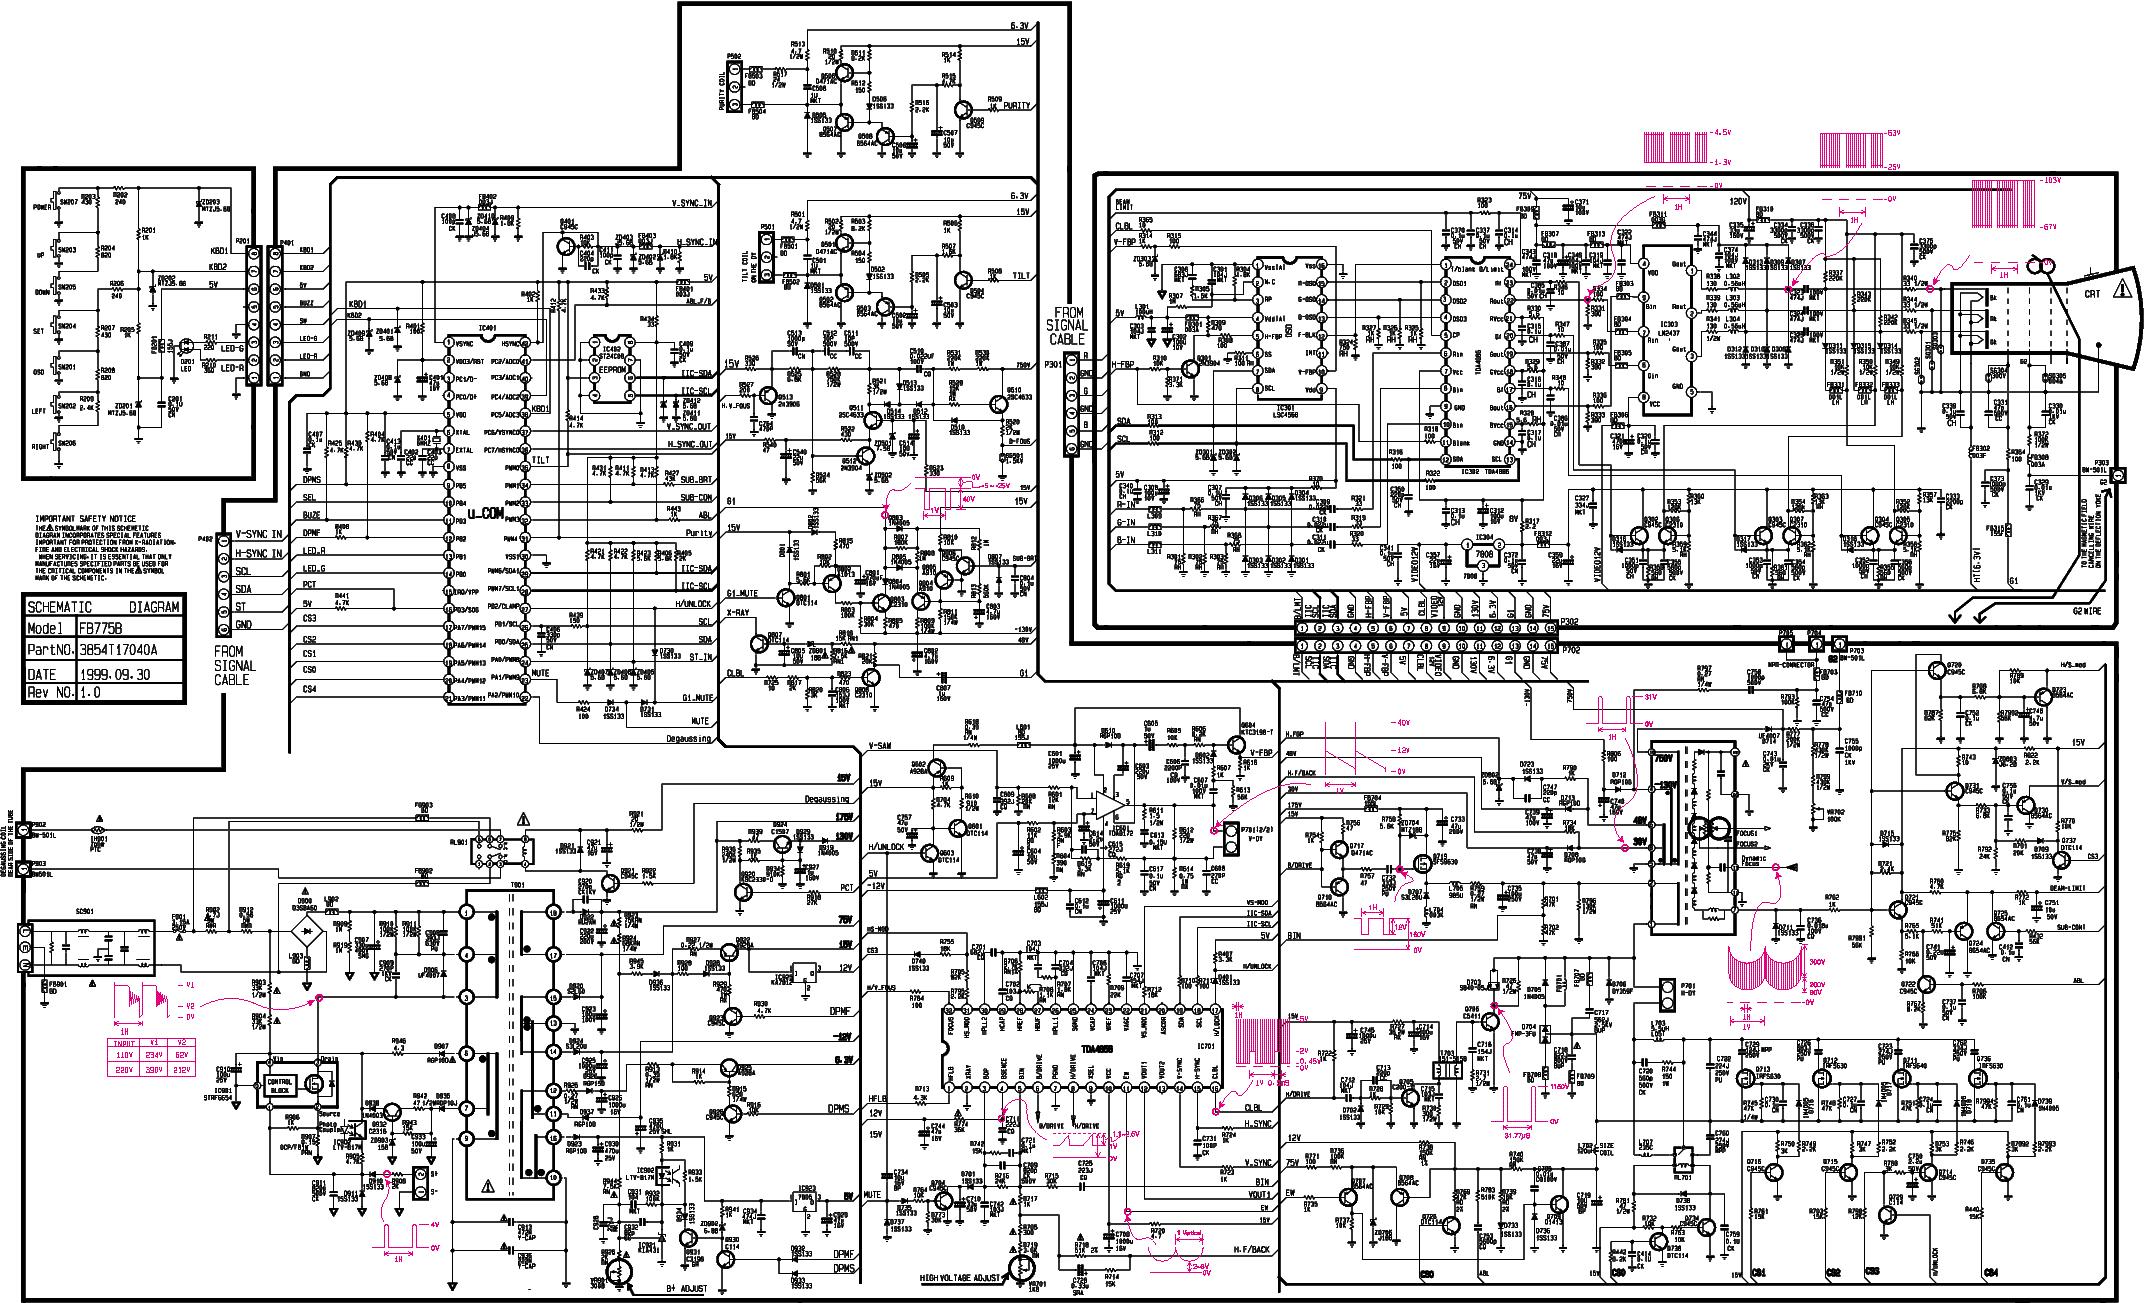 Hyundai ha-201 принципиальная схема